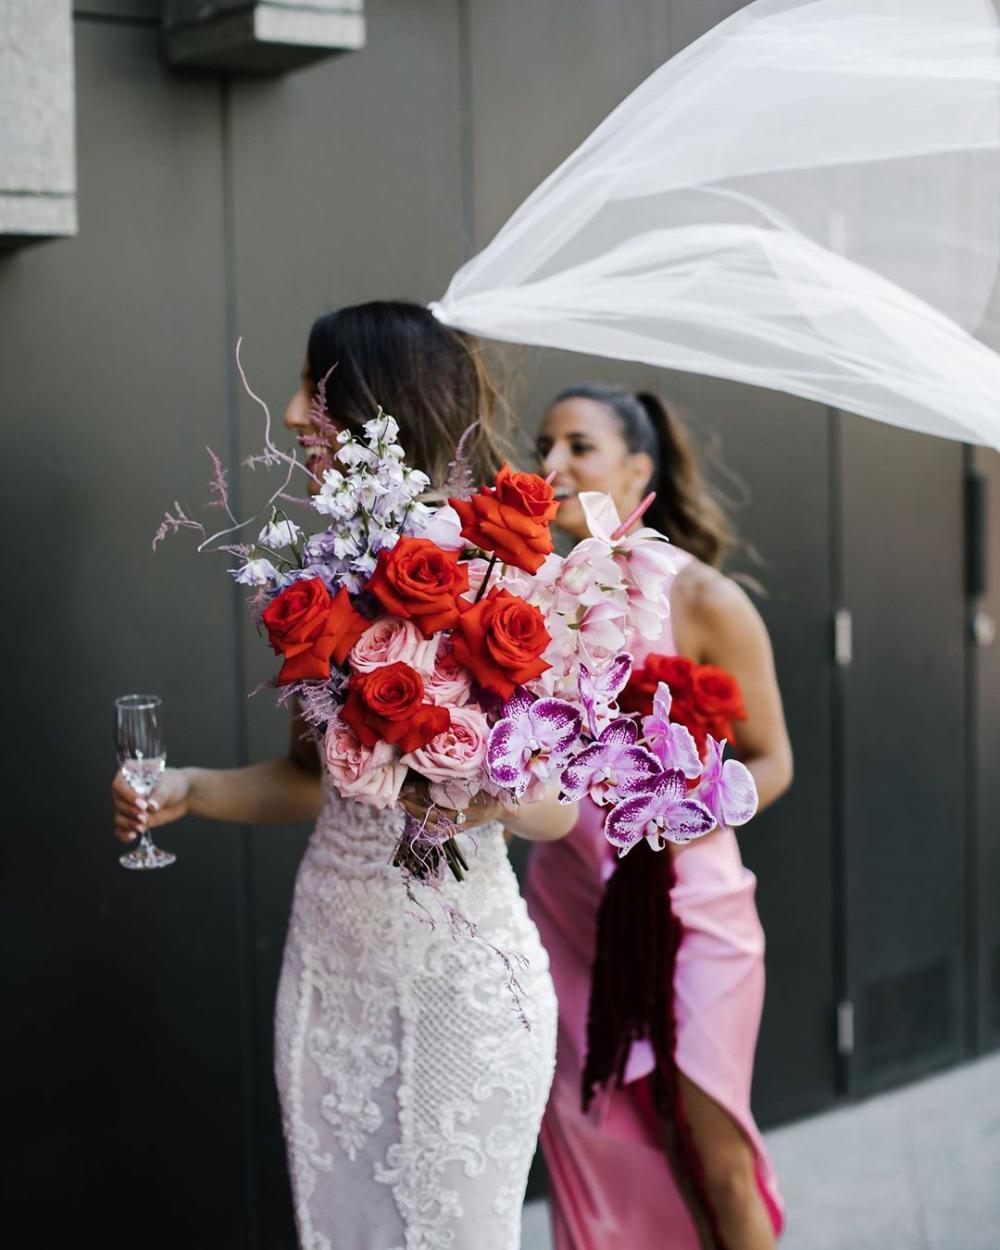 Pin By Palmer Flowers Loveland On Bouquet Dreamin In 2020 Colorful Wedding Flowers Wedding Flower Decorations Wedding